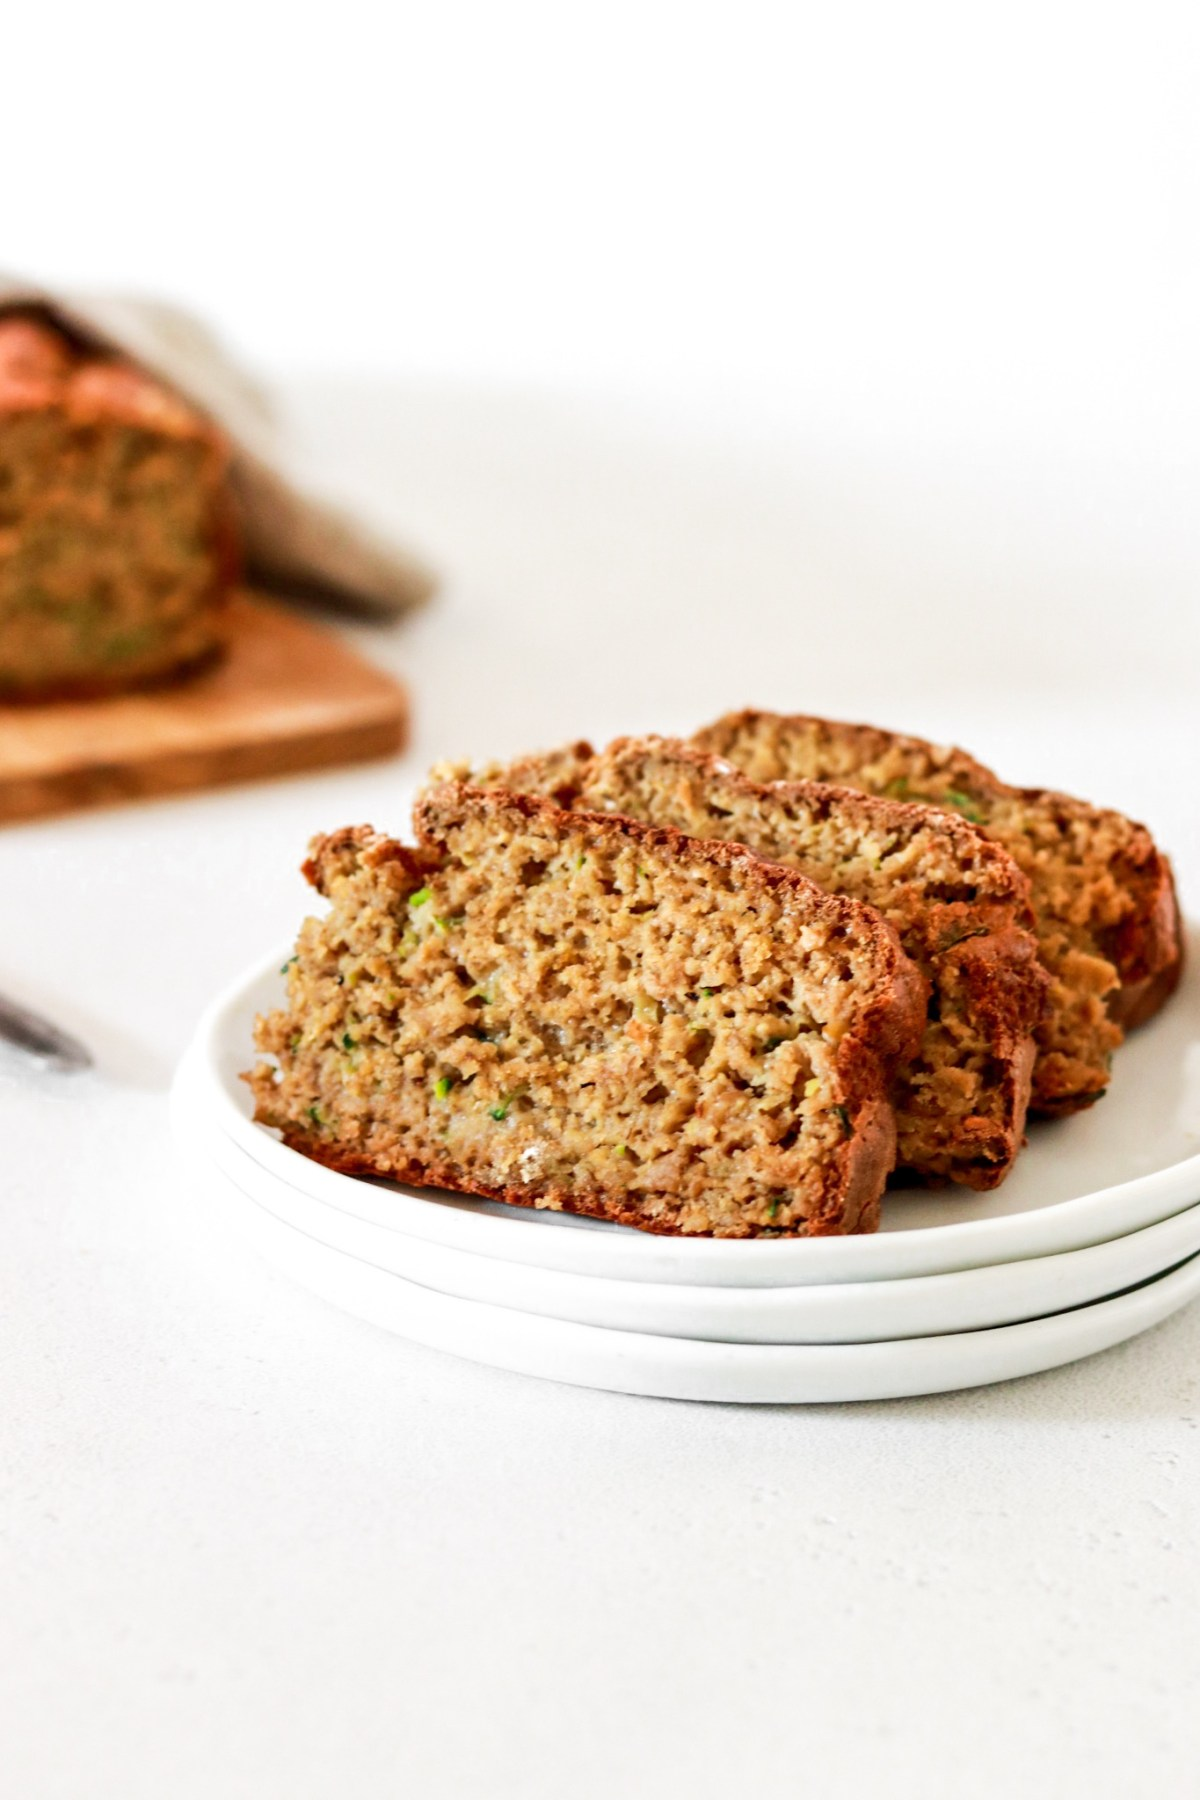 Zucchini Bread (Gluten, Sugar, Oil Free) From Front Sliced